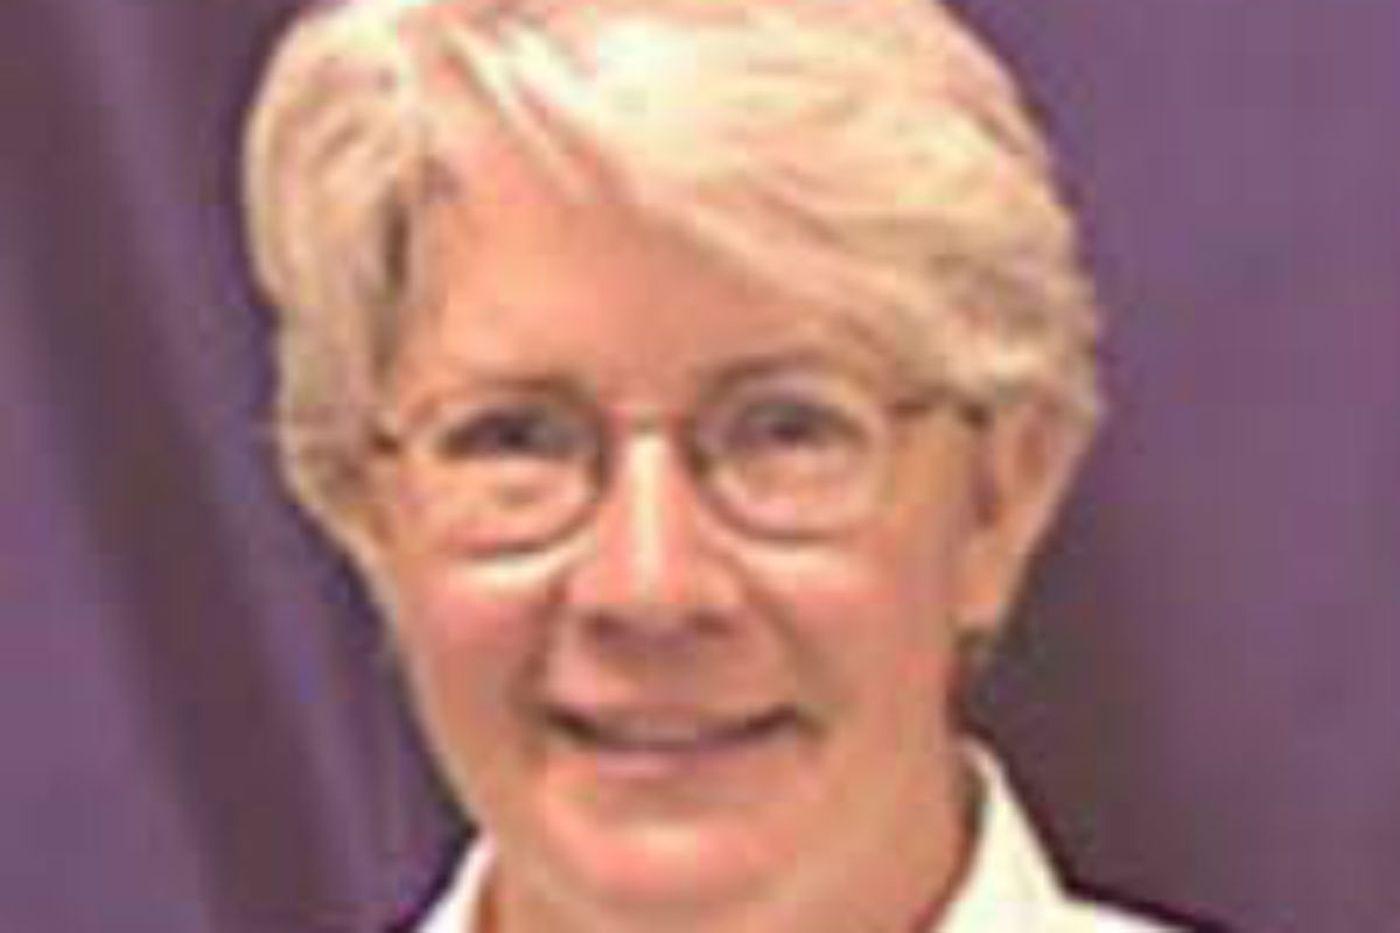 Services set for Dr. Sharon M. Curlik, 64, psychiatrist to the elderly